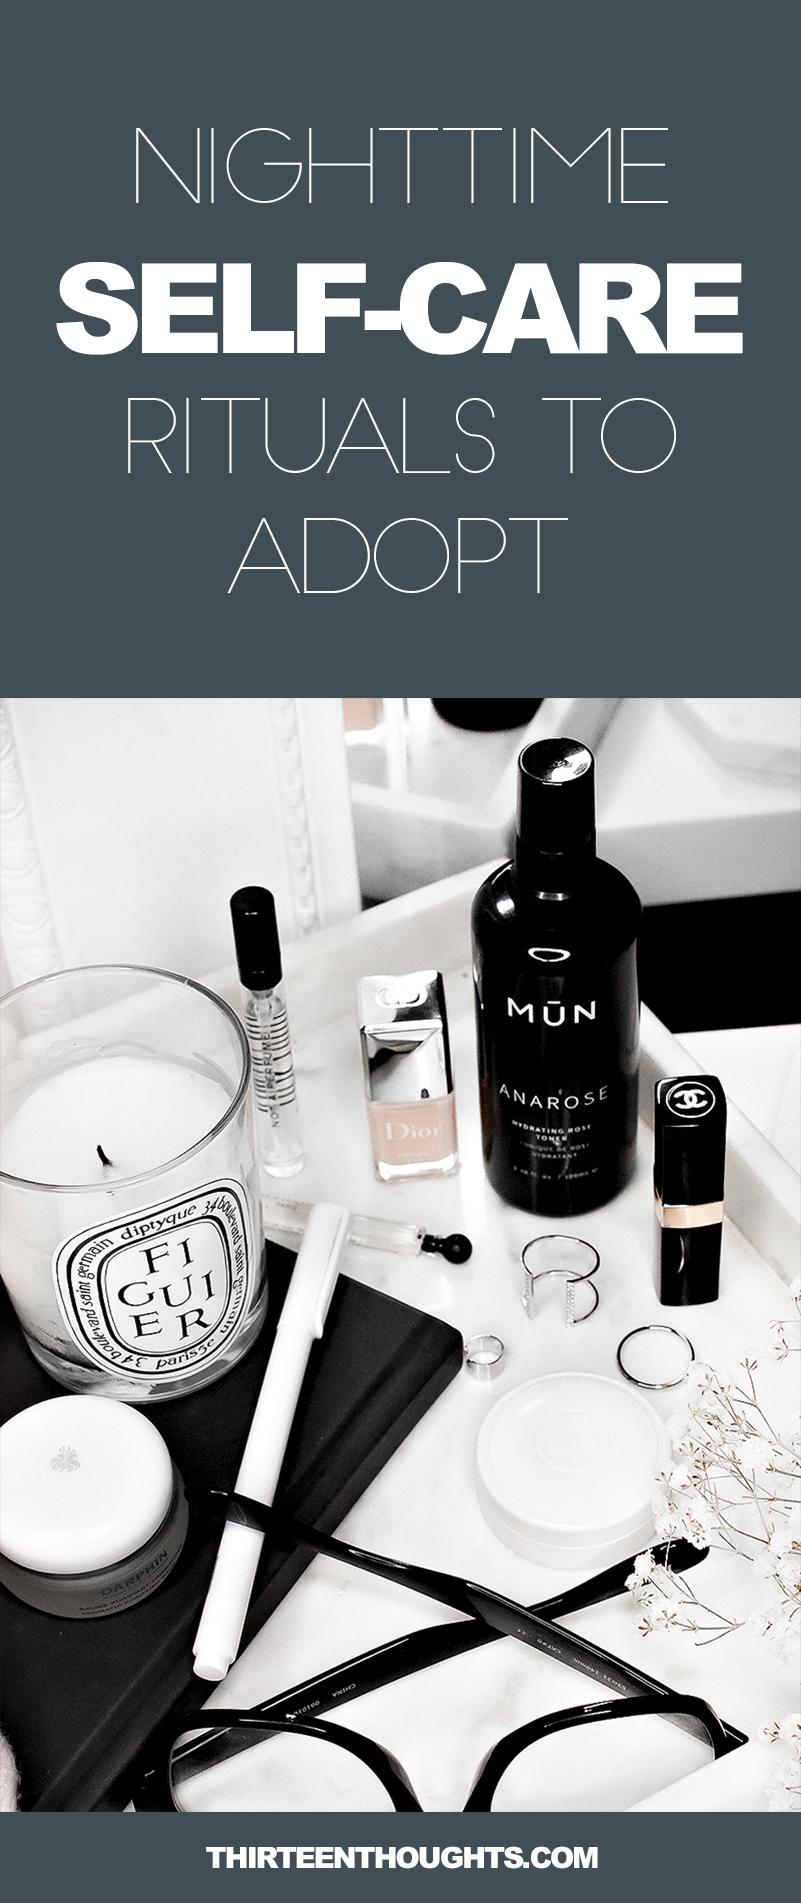 Nighttime Self-Care Rituals to Adopt